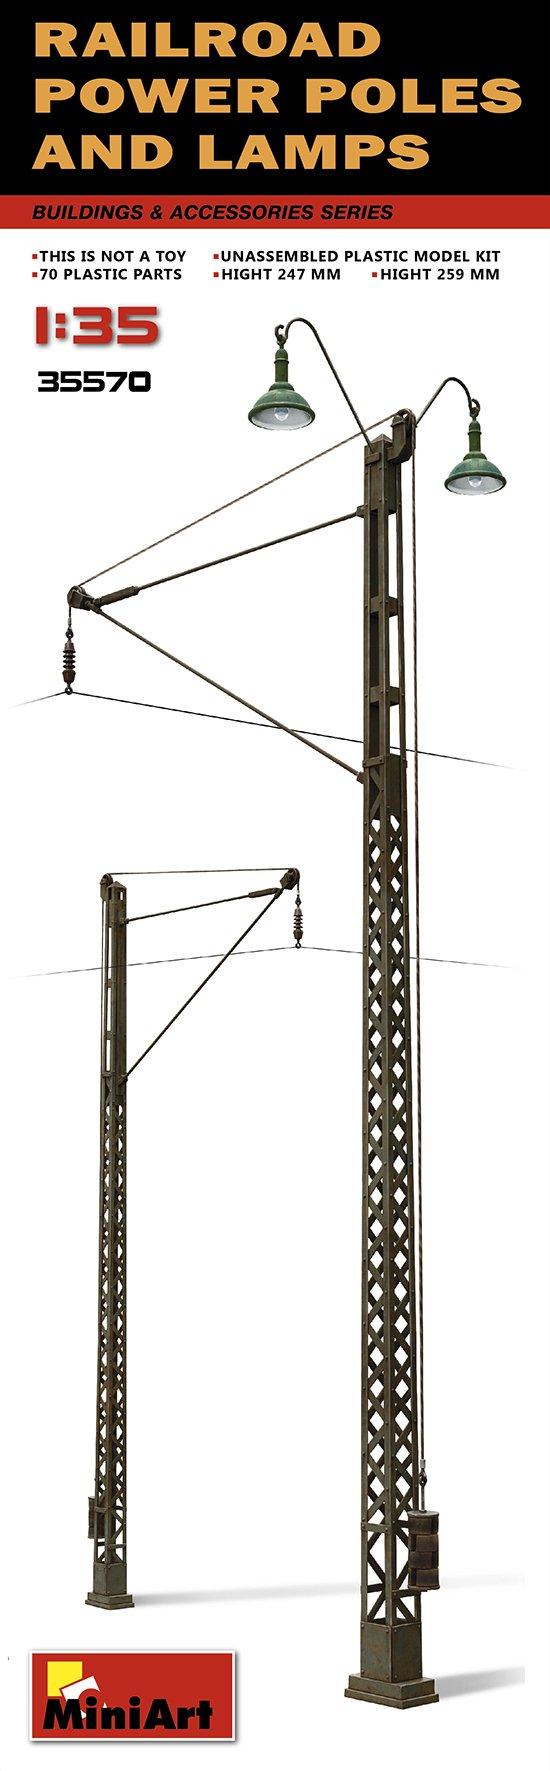 PLASTIC MODEL BUILDING DIORAMA RAILROAD POWER POLES AND LAMPS 1/35 MINIART 35570